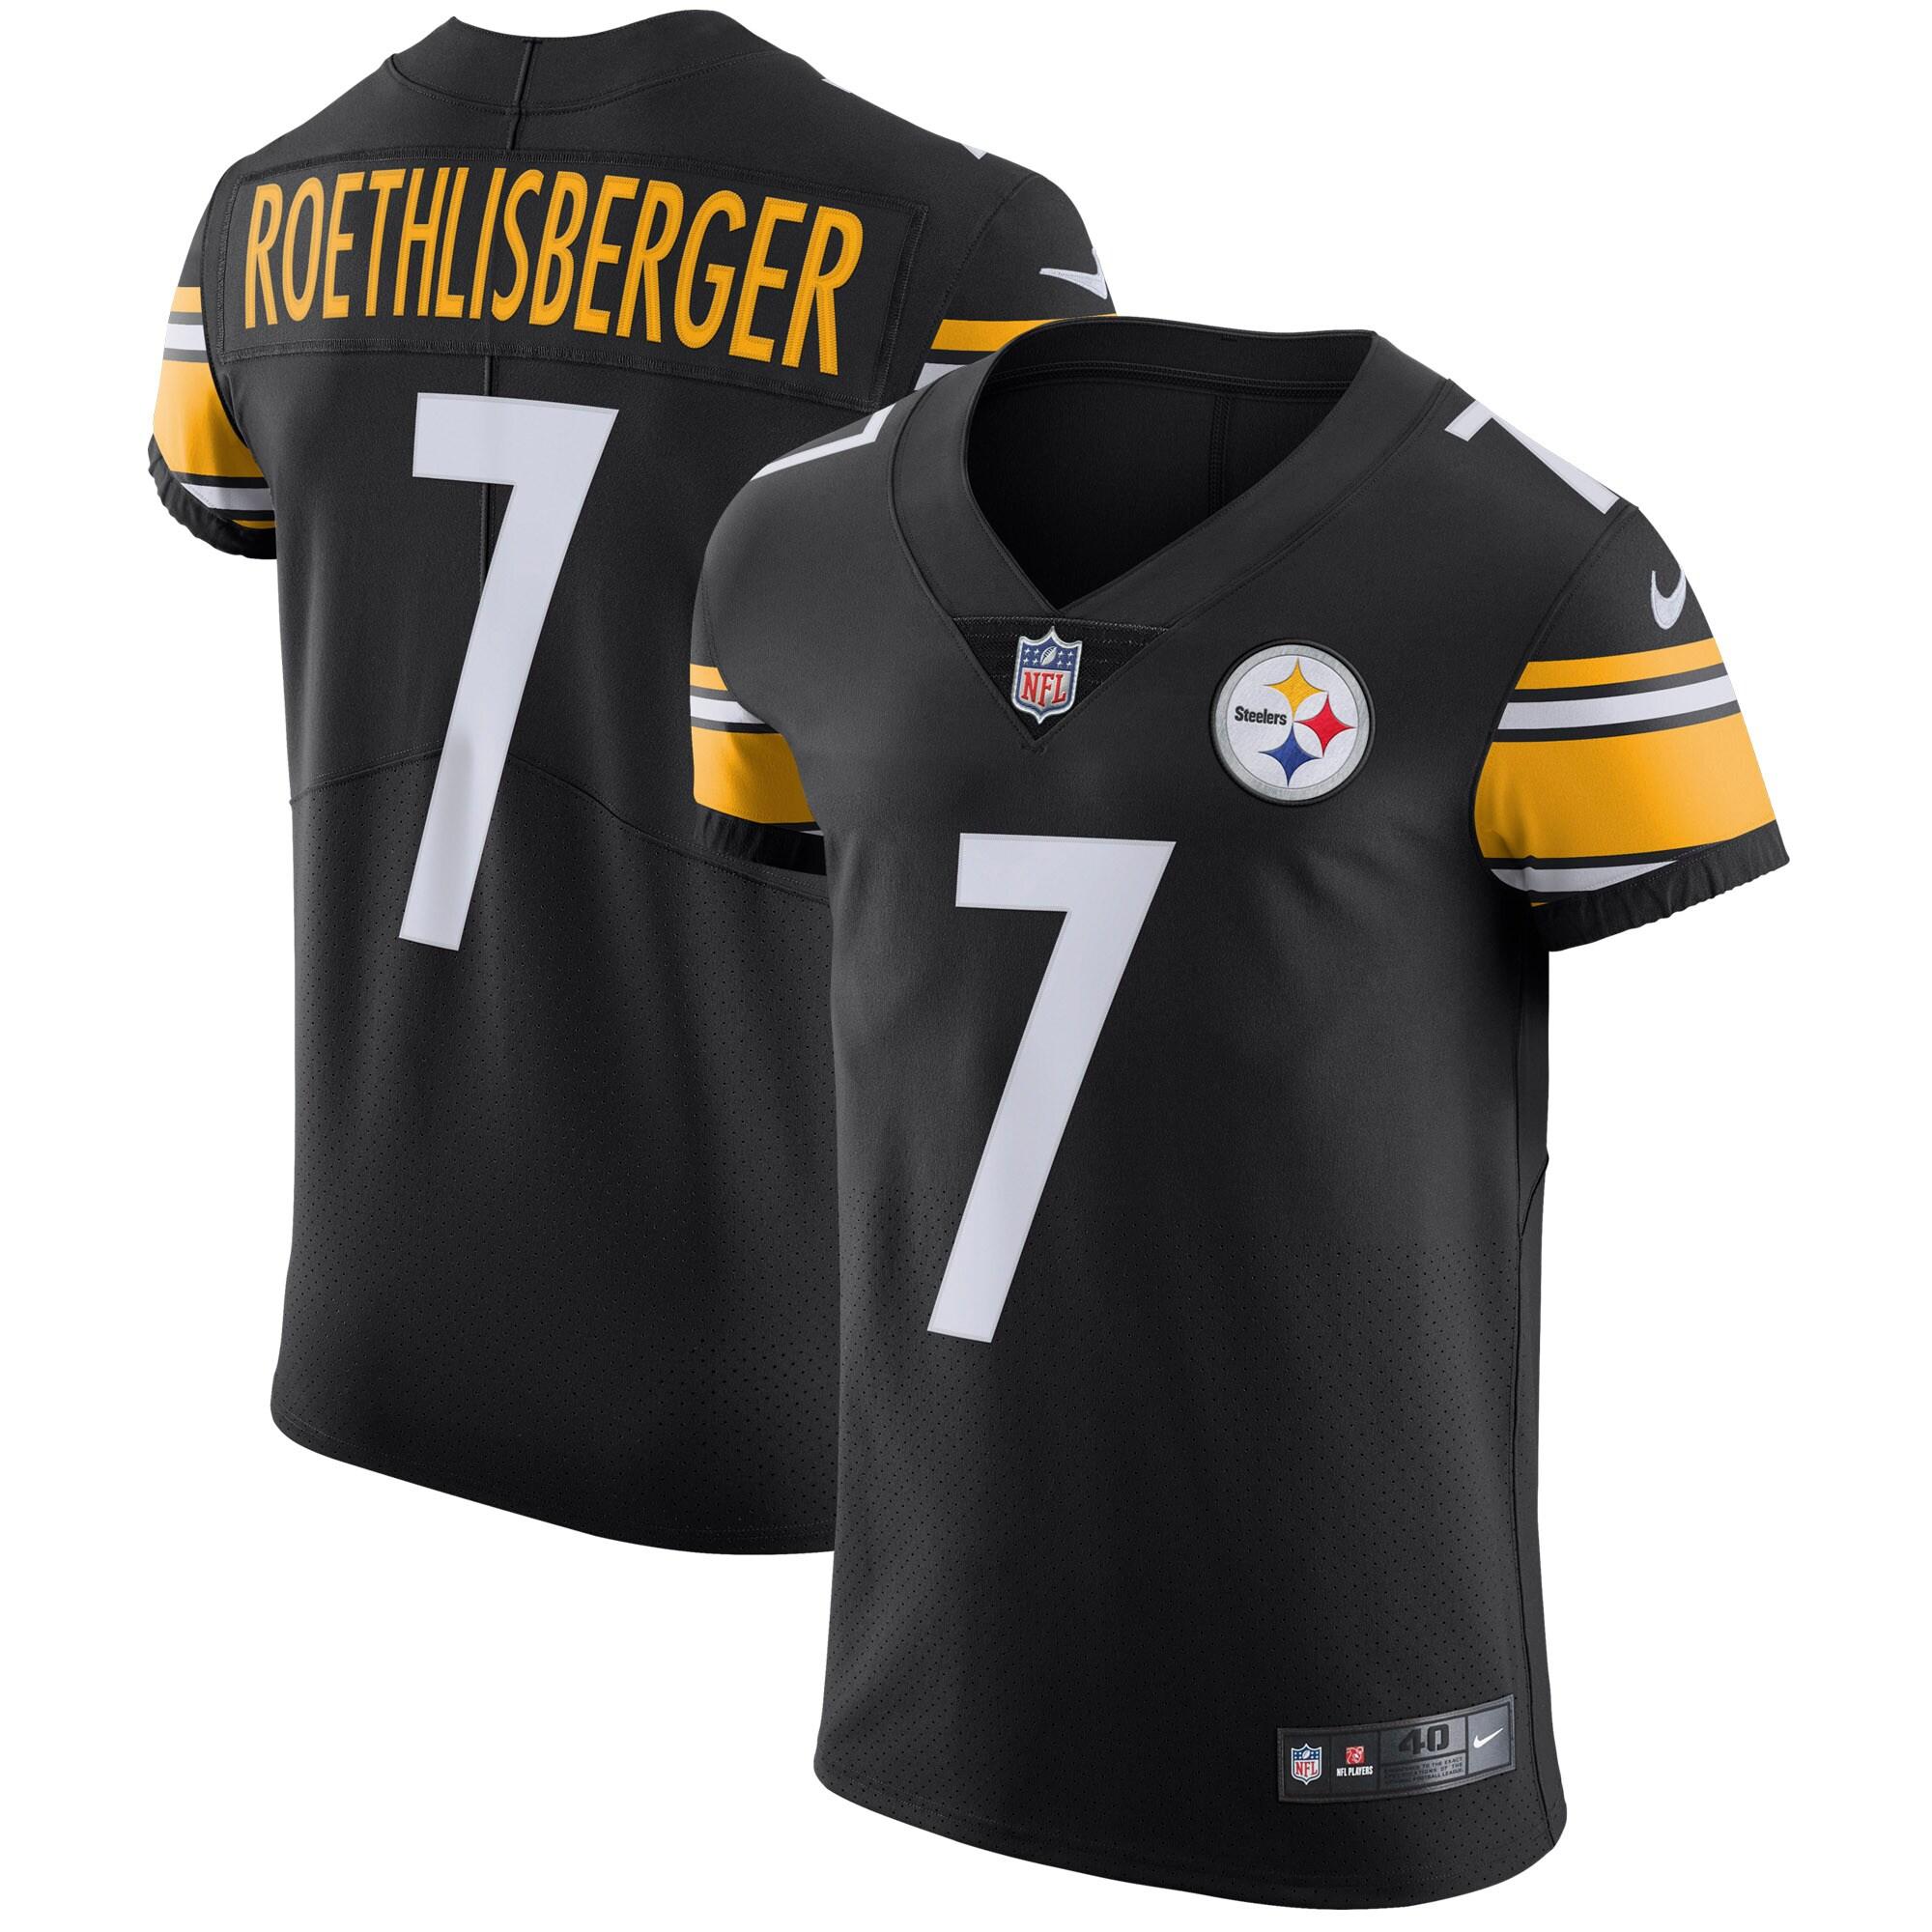 Ben Roethlisberger Pittsburgh Steelers Nike Vapor Untouchable Elite Player Jersey - Black